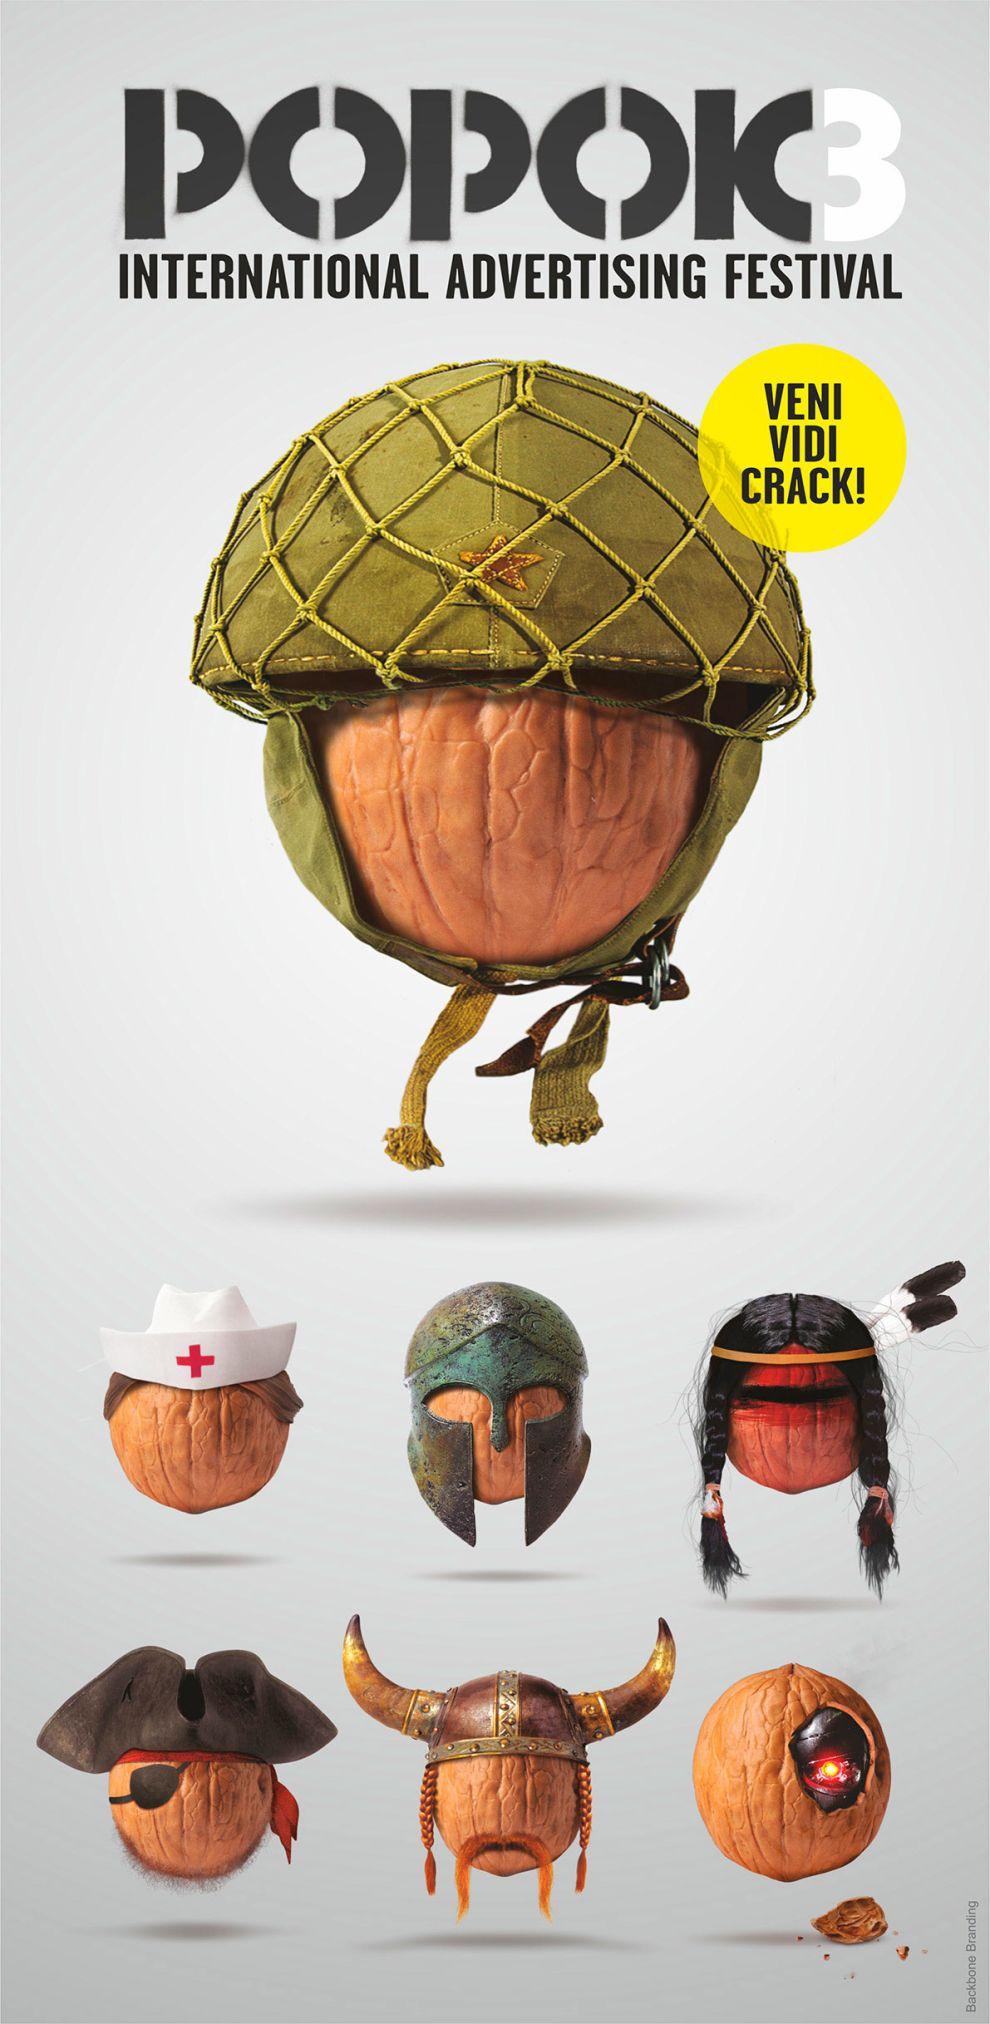 Popok3 Fun Package Design